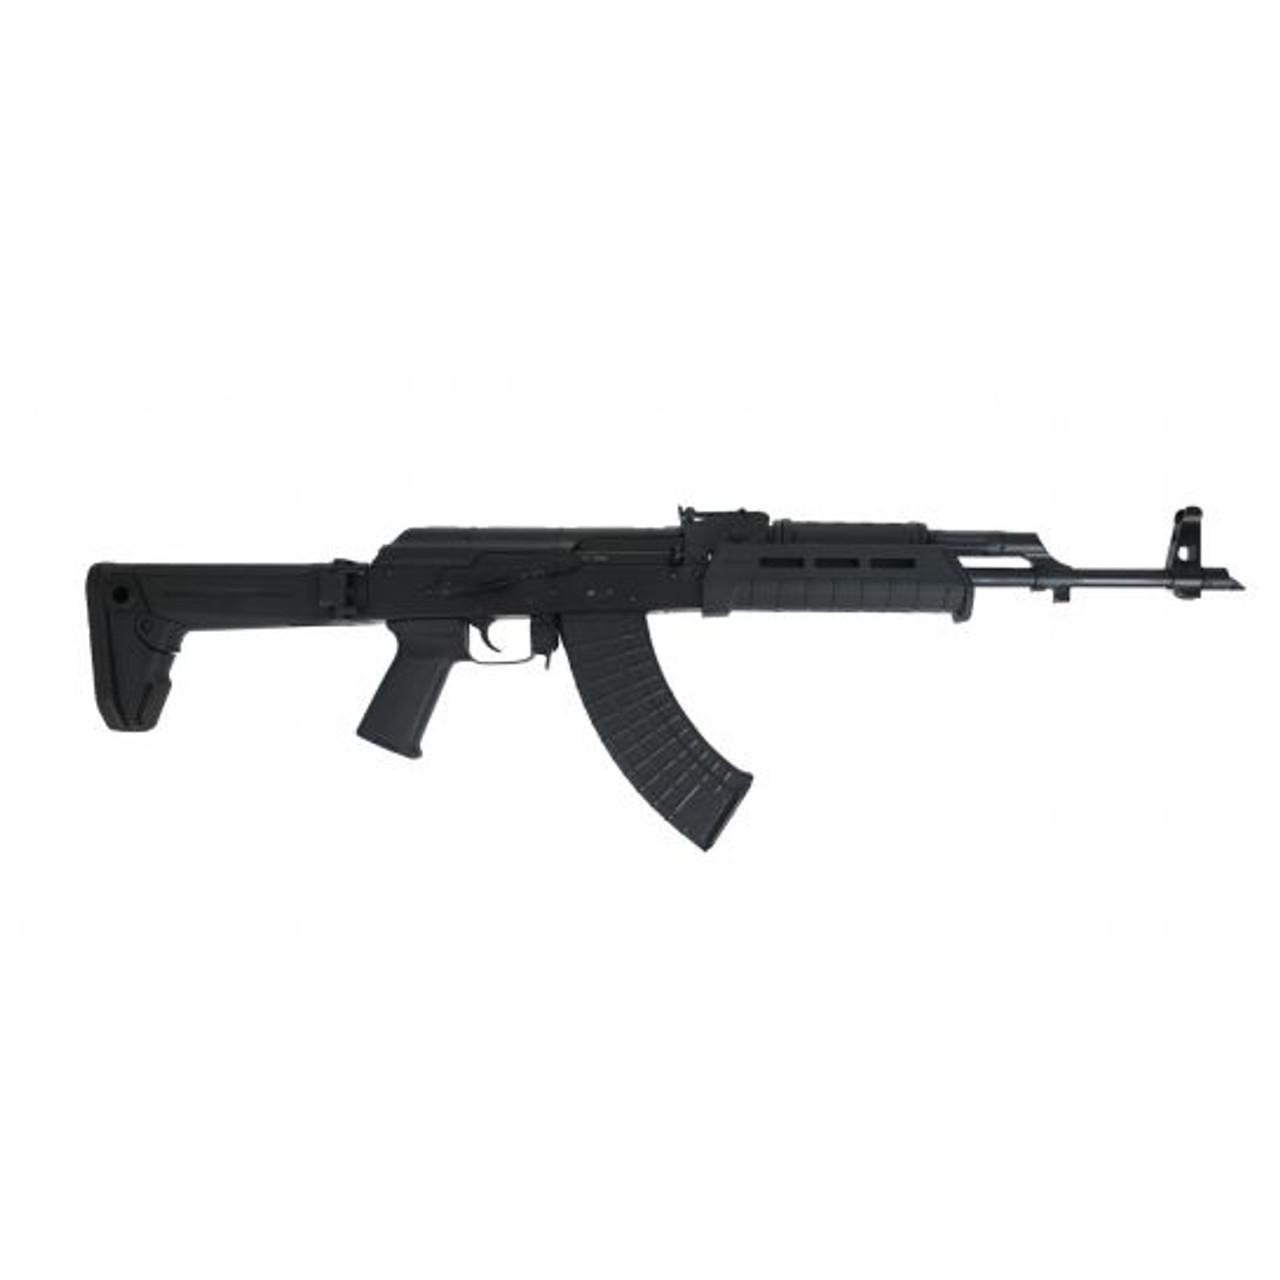 "Palmetto State Armory Blem PSAK-47 GF3 ""Moekov"" CALIFORNIA LEGAL - 7.62x39"